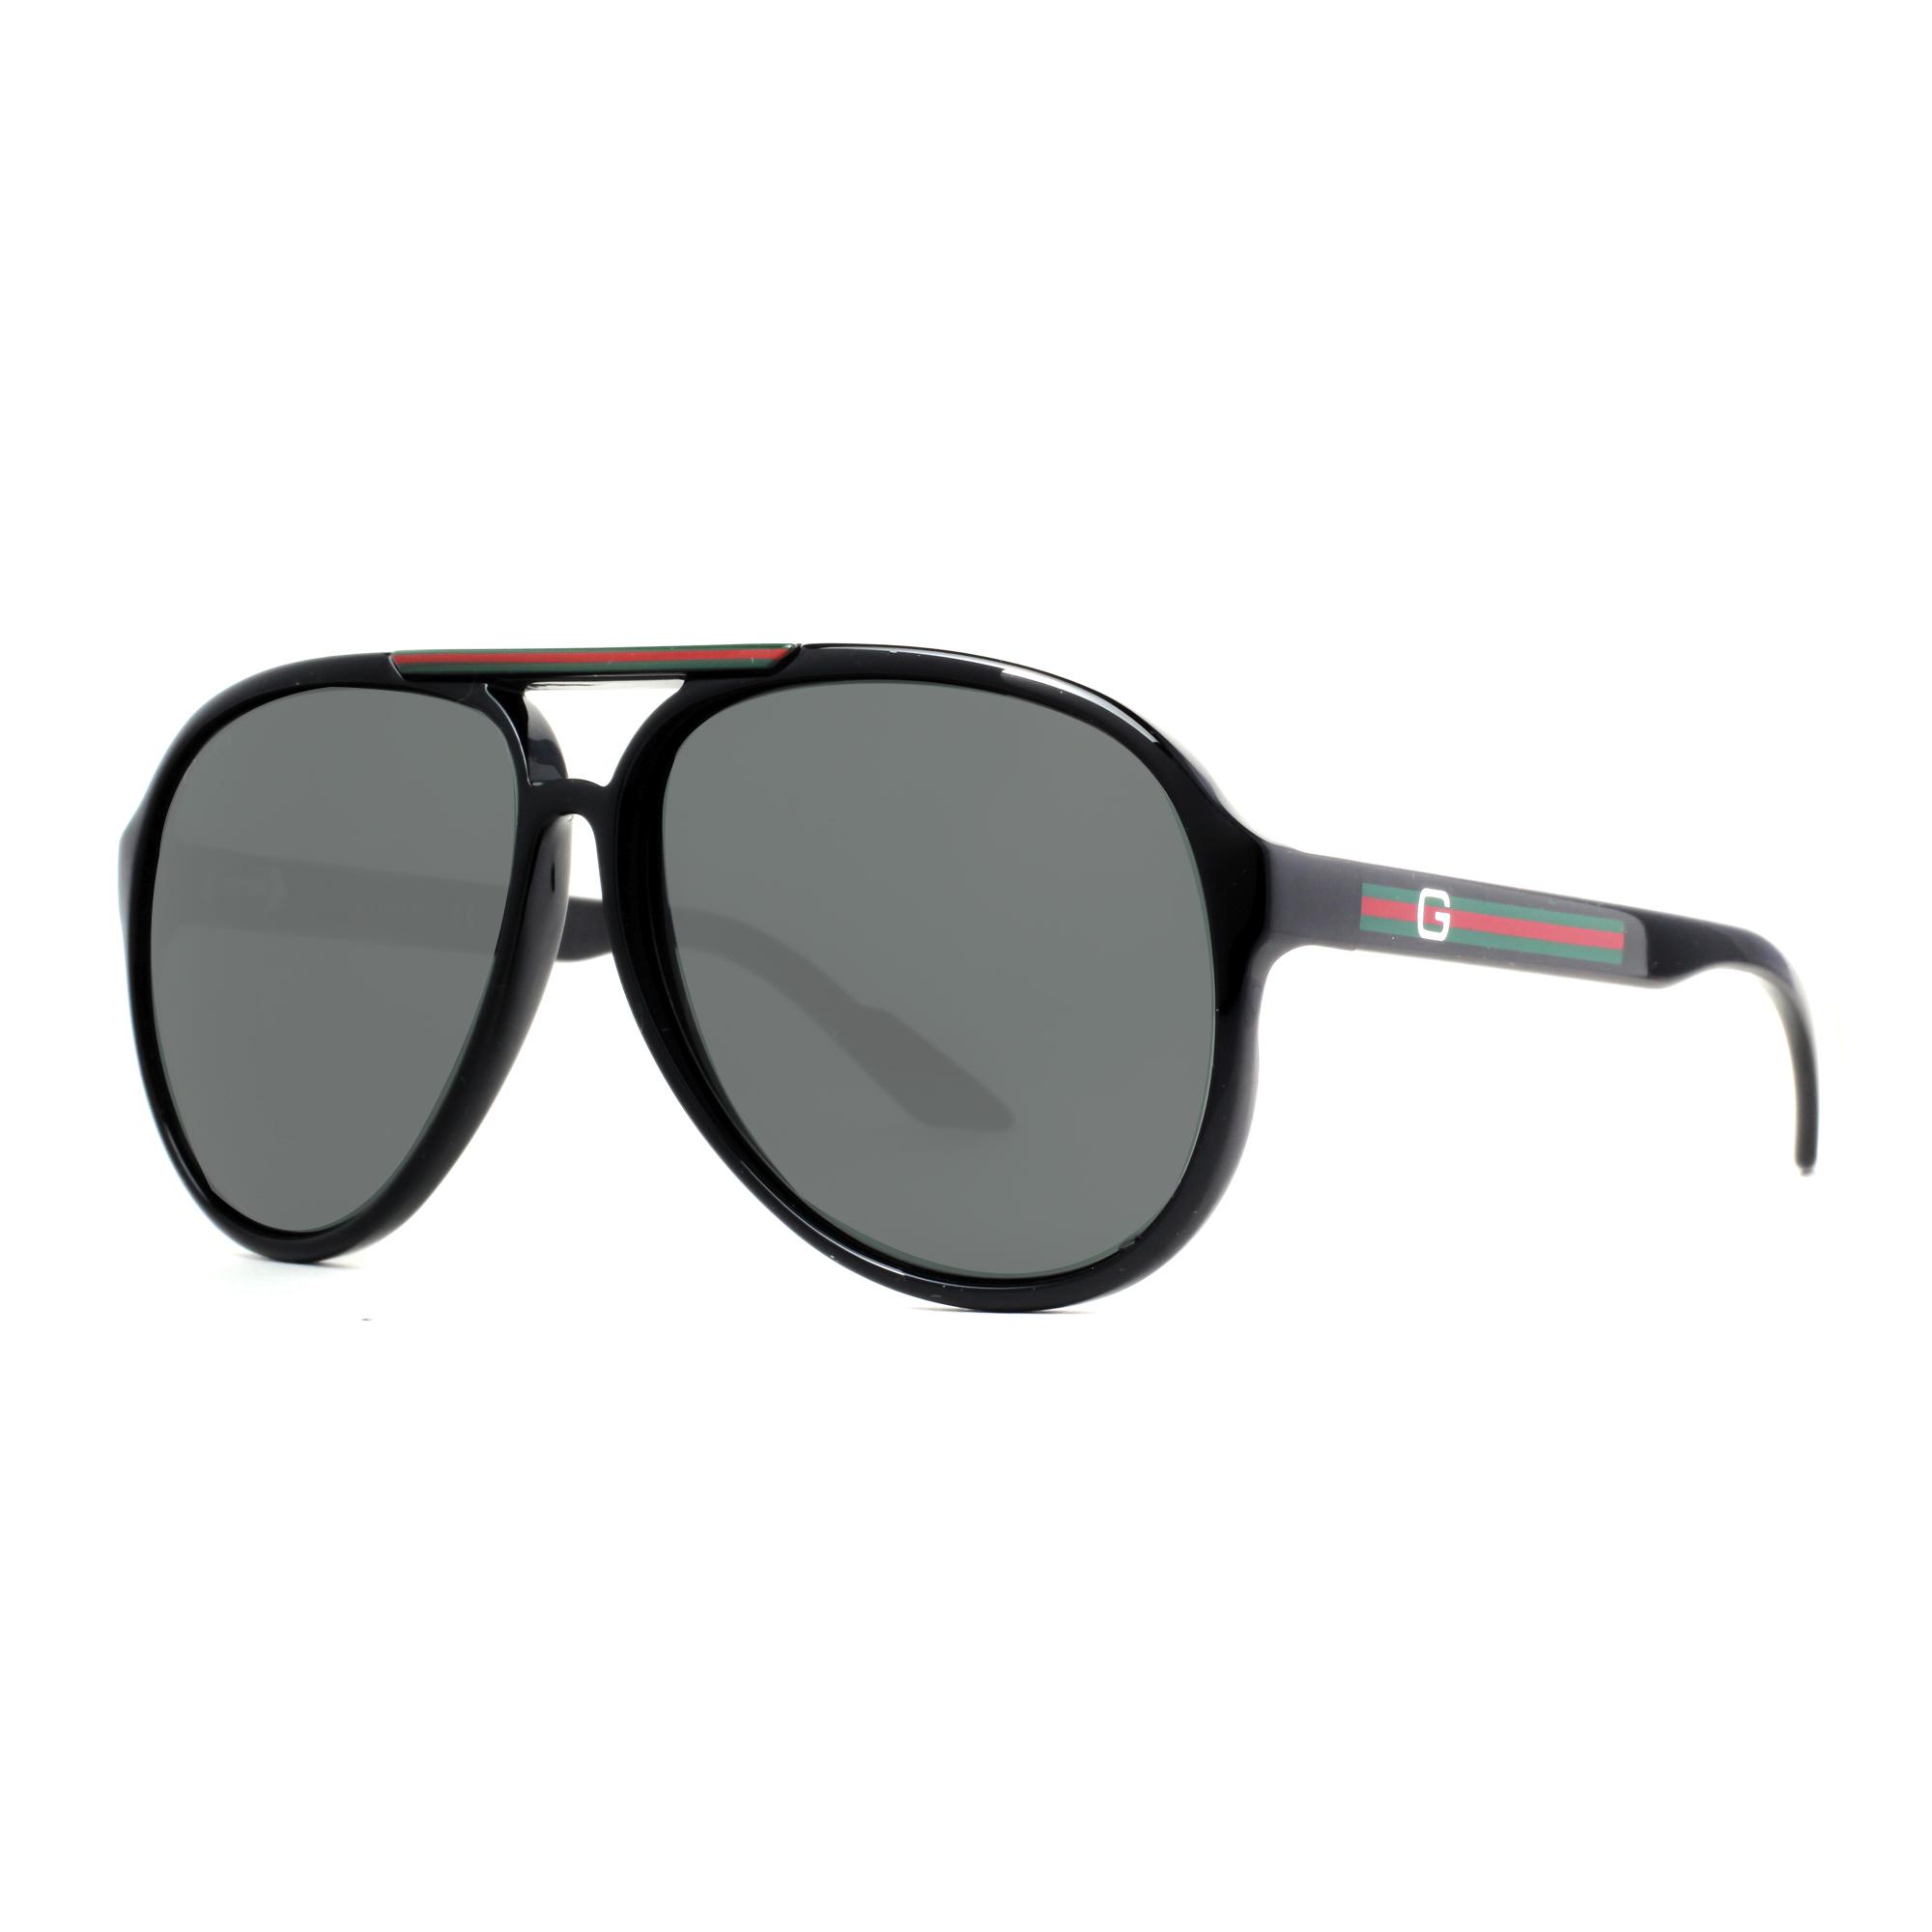 9e1bed95cc0 Aviator Sunglasses On Ebay